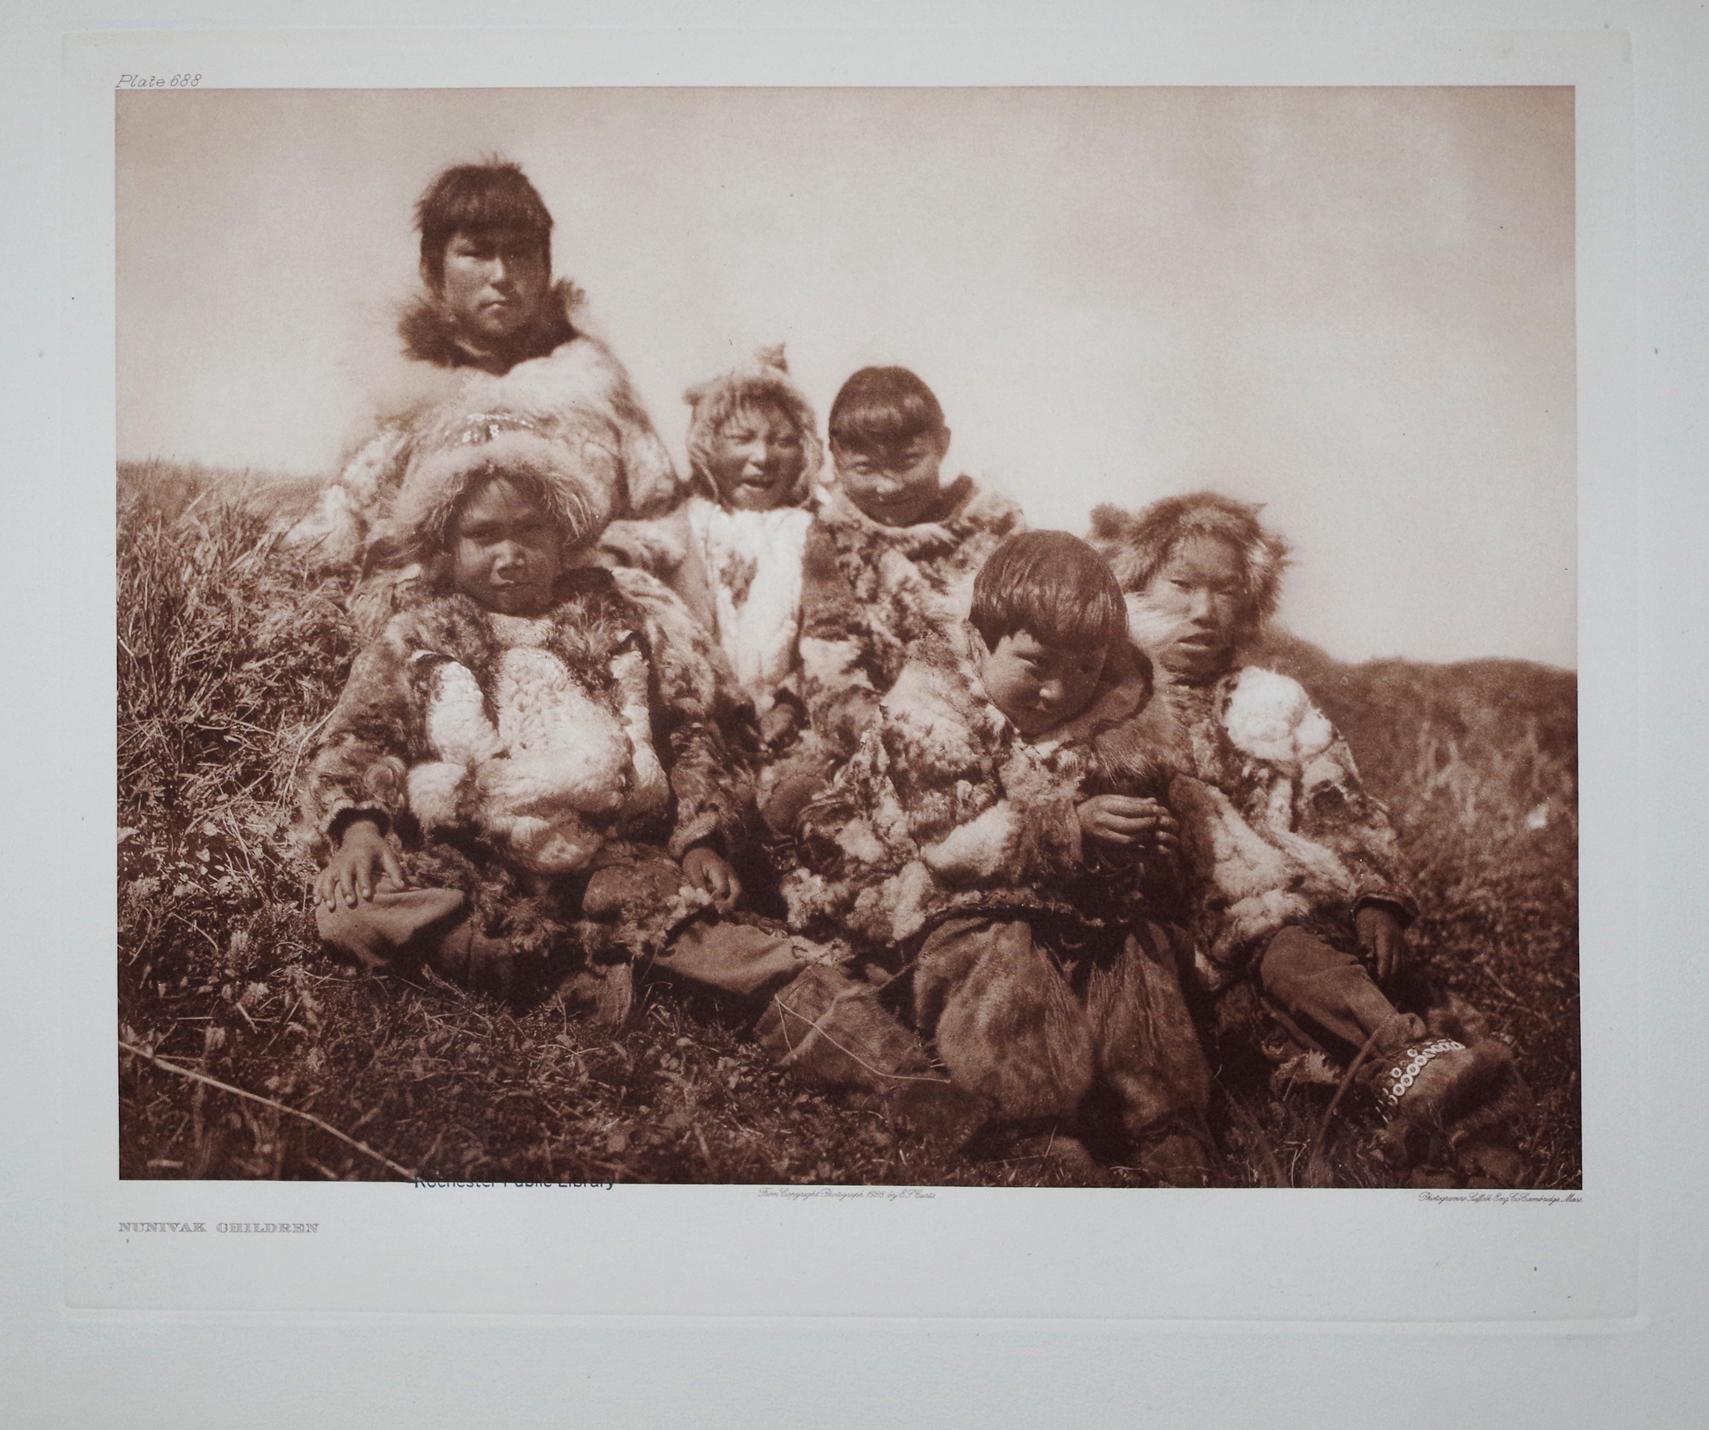 Nunivak Children, Plate 688 from The North American Indian. Portfolio XX: Edward S. Curtis (1868-...